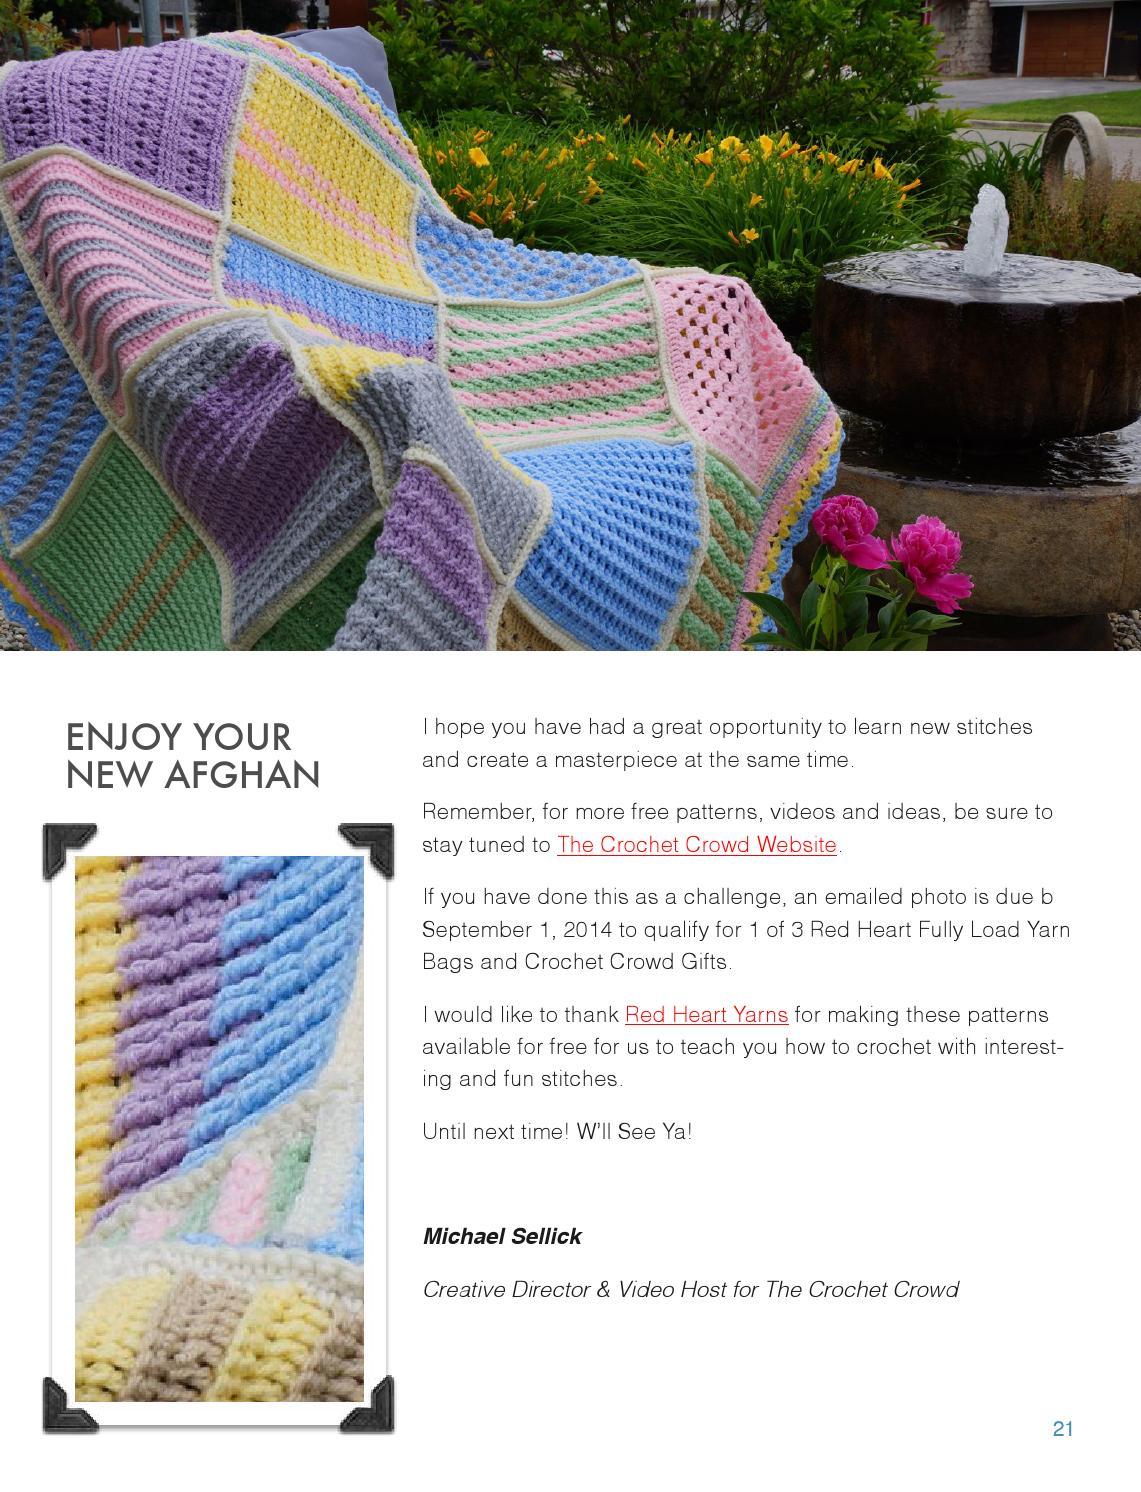 Stitch-cation Crochet Workbook